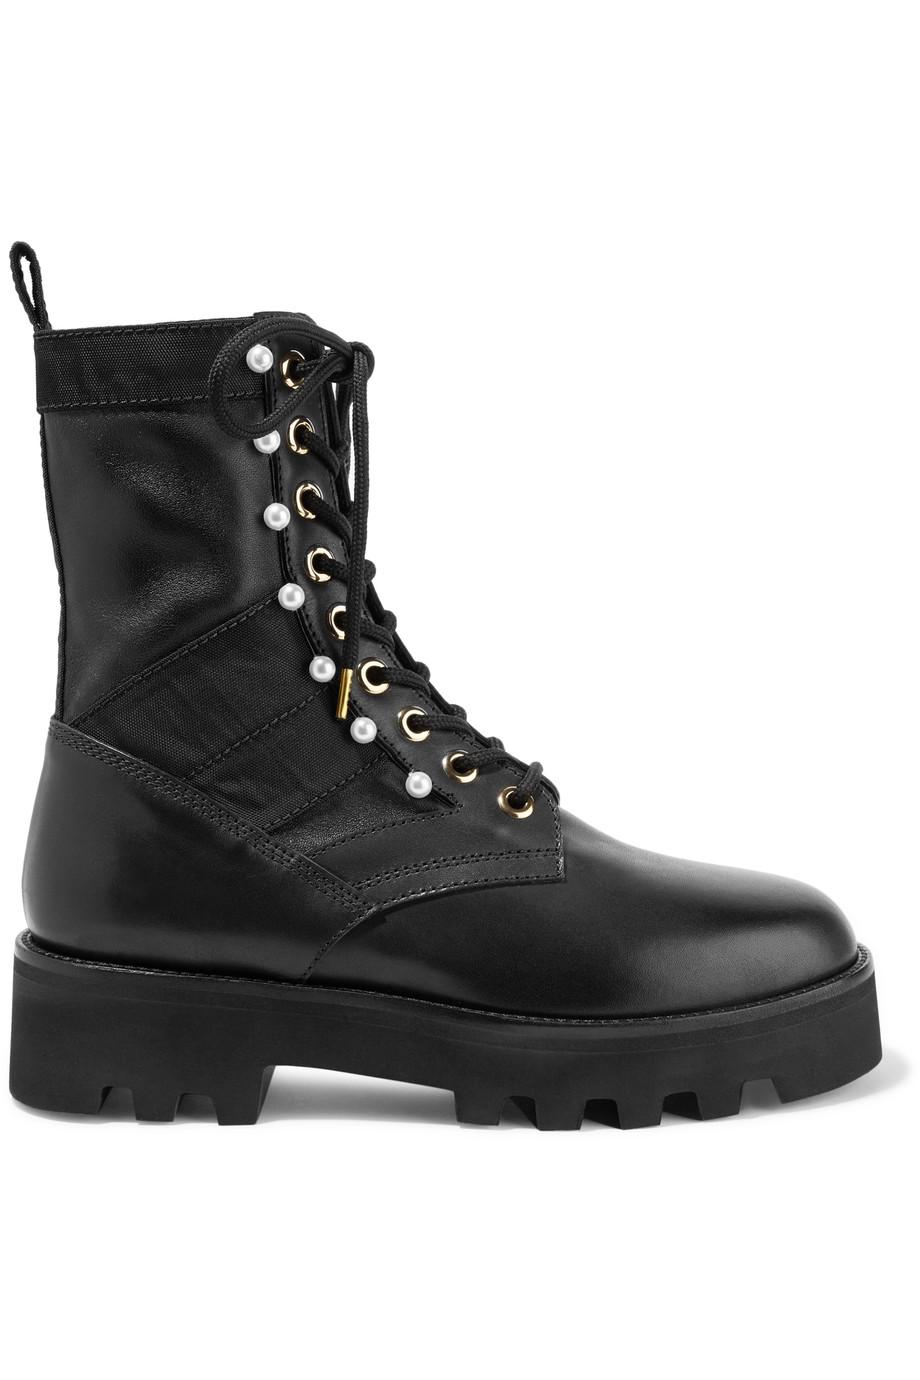 W boots.jpg